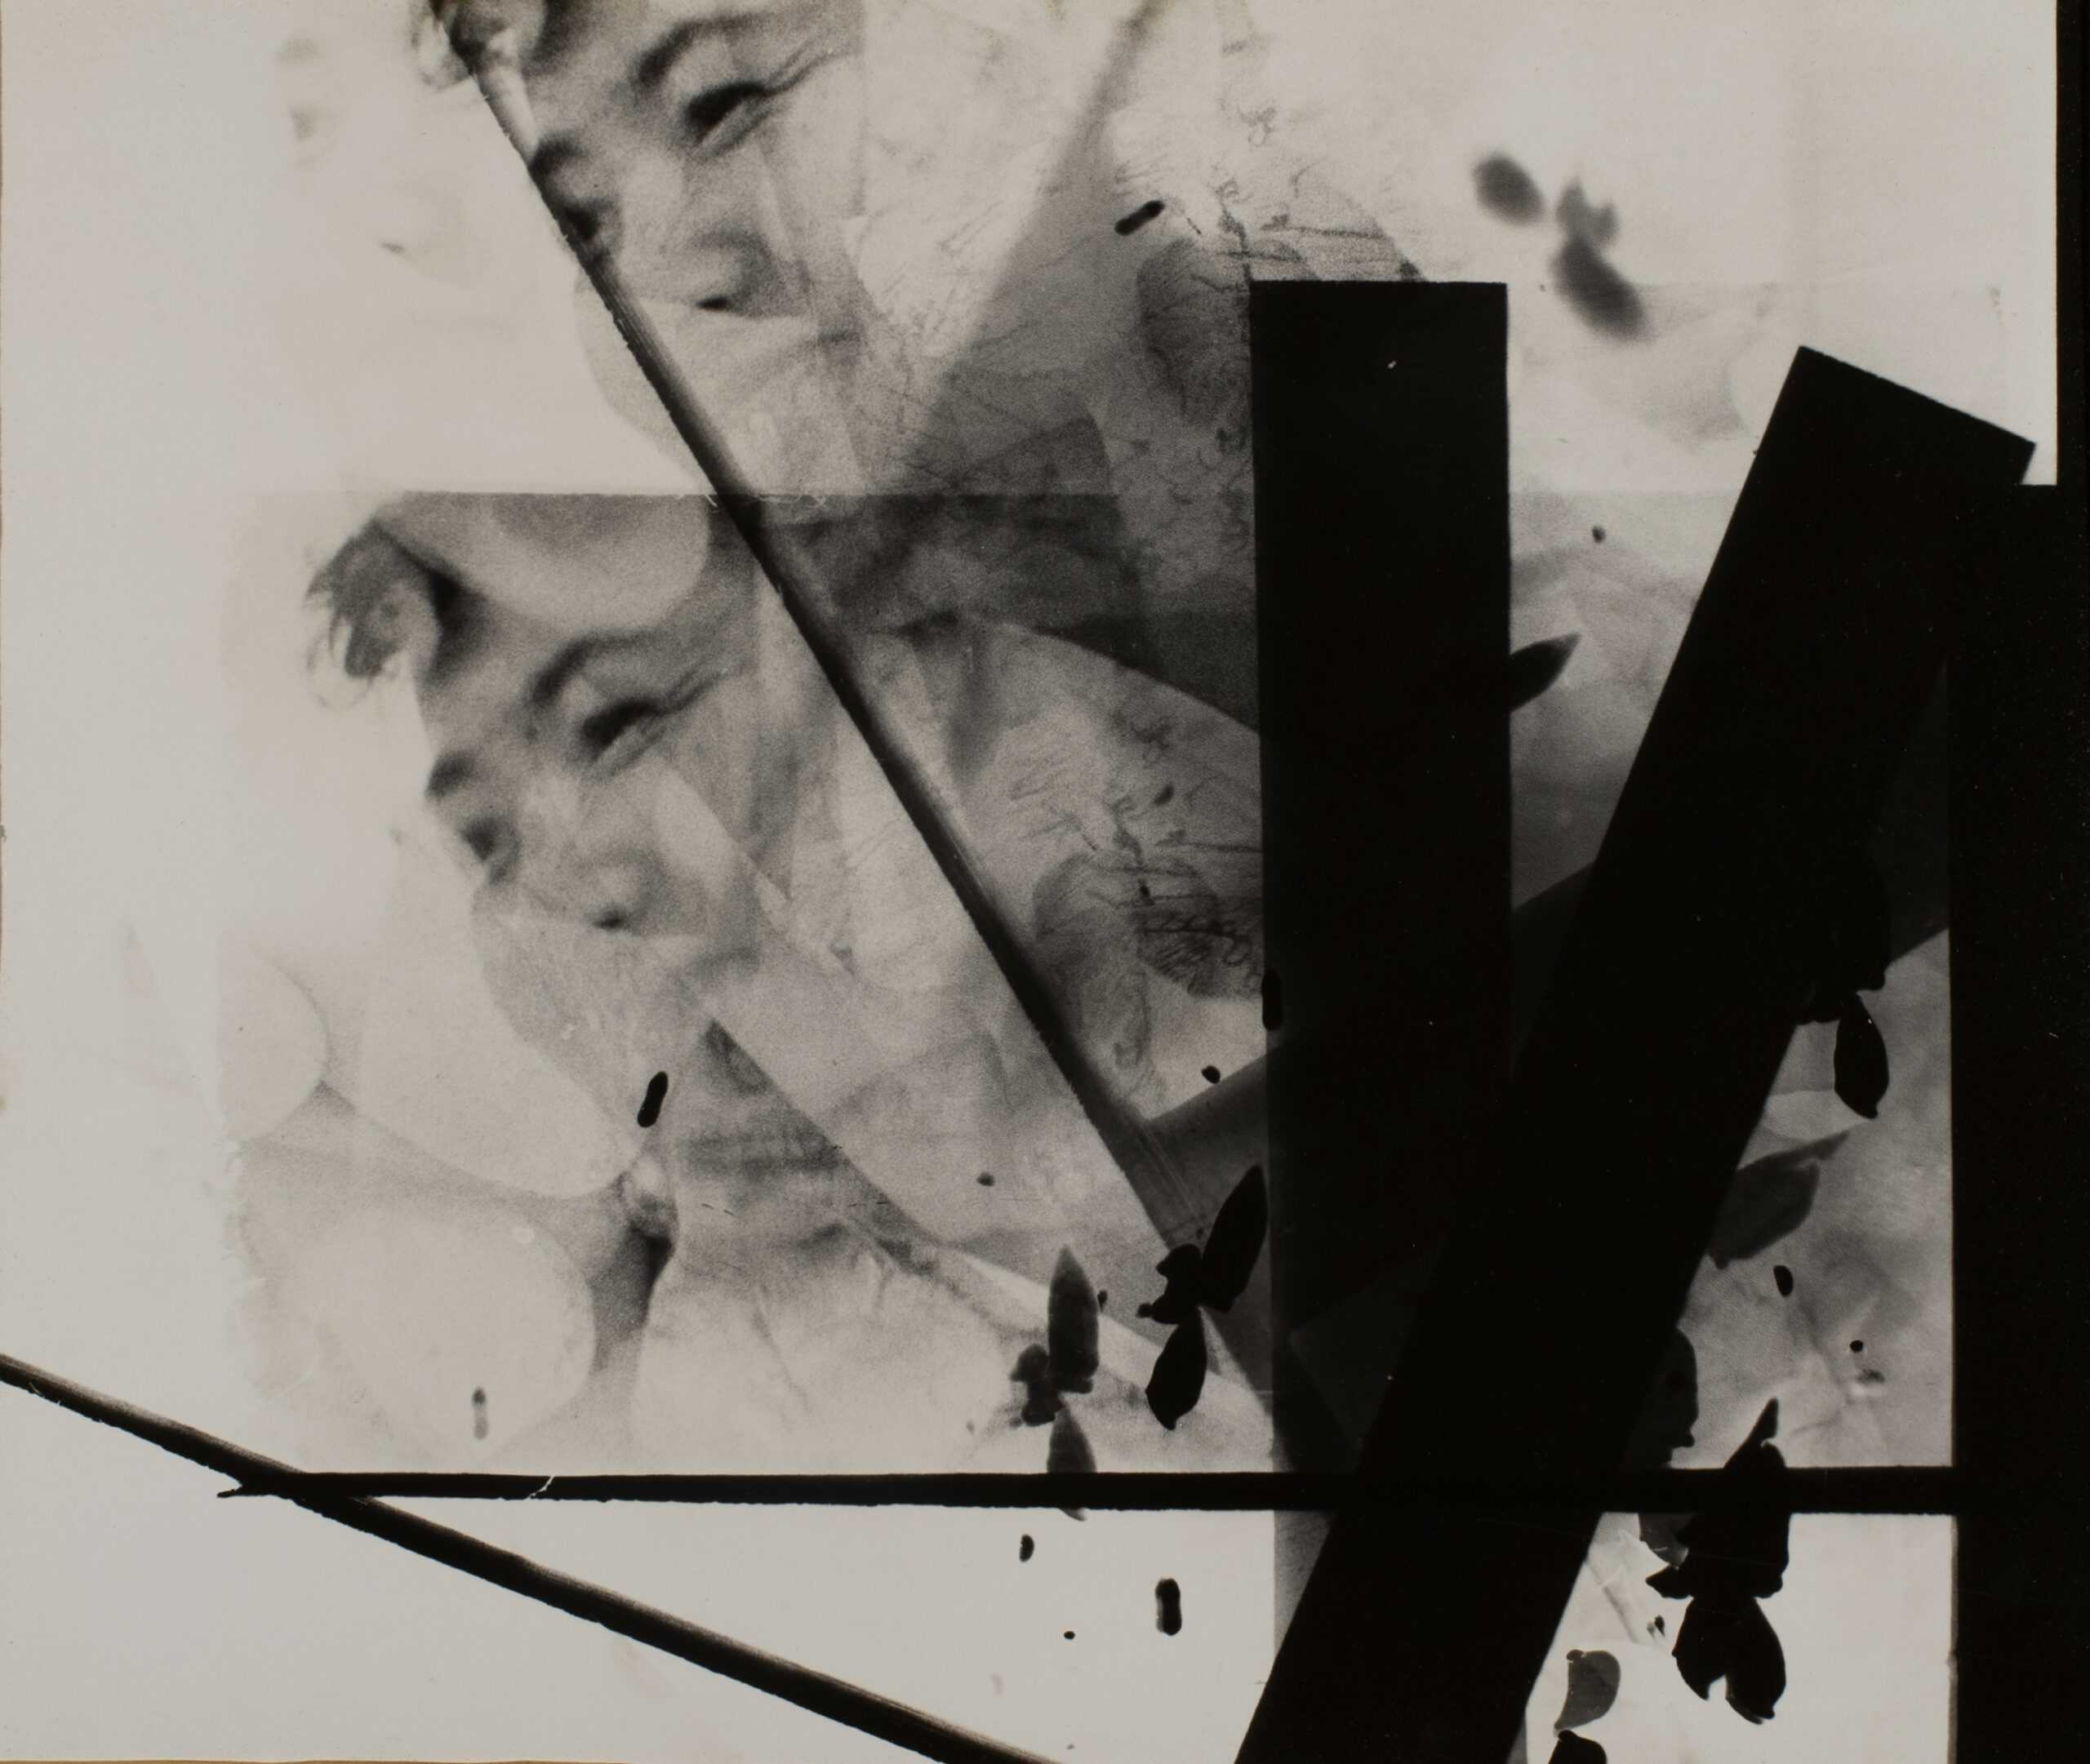 SHIGERU ONISHI: THE POSSIBILITY OF EXISTENCE